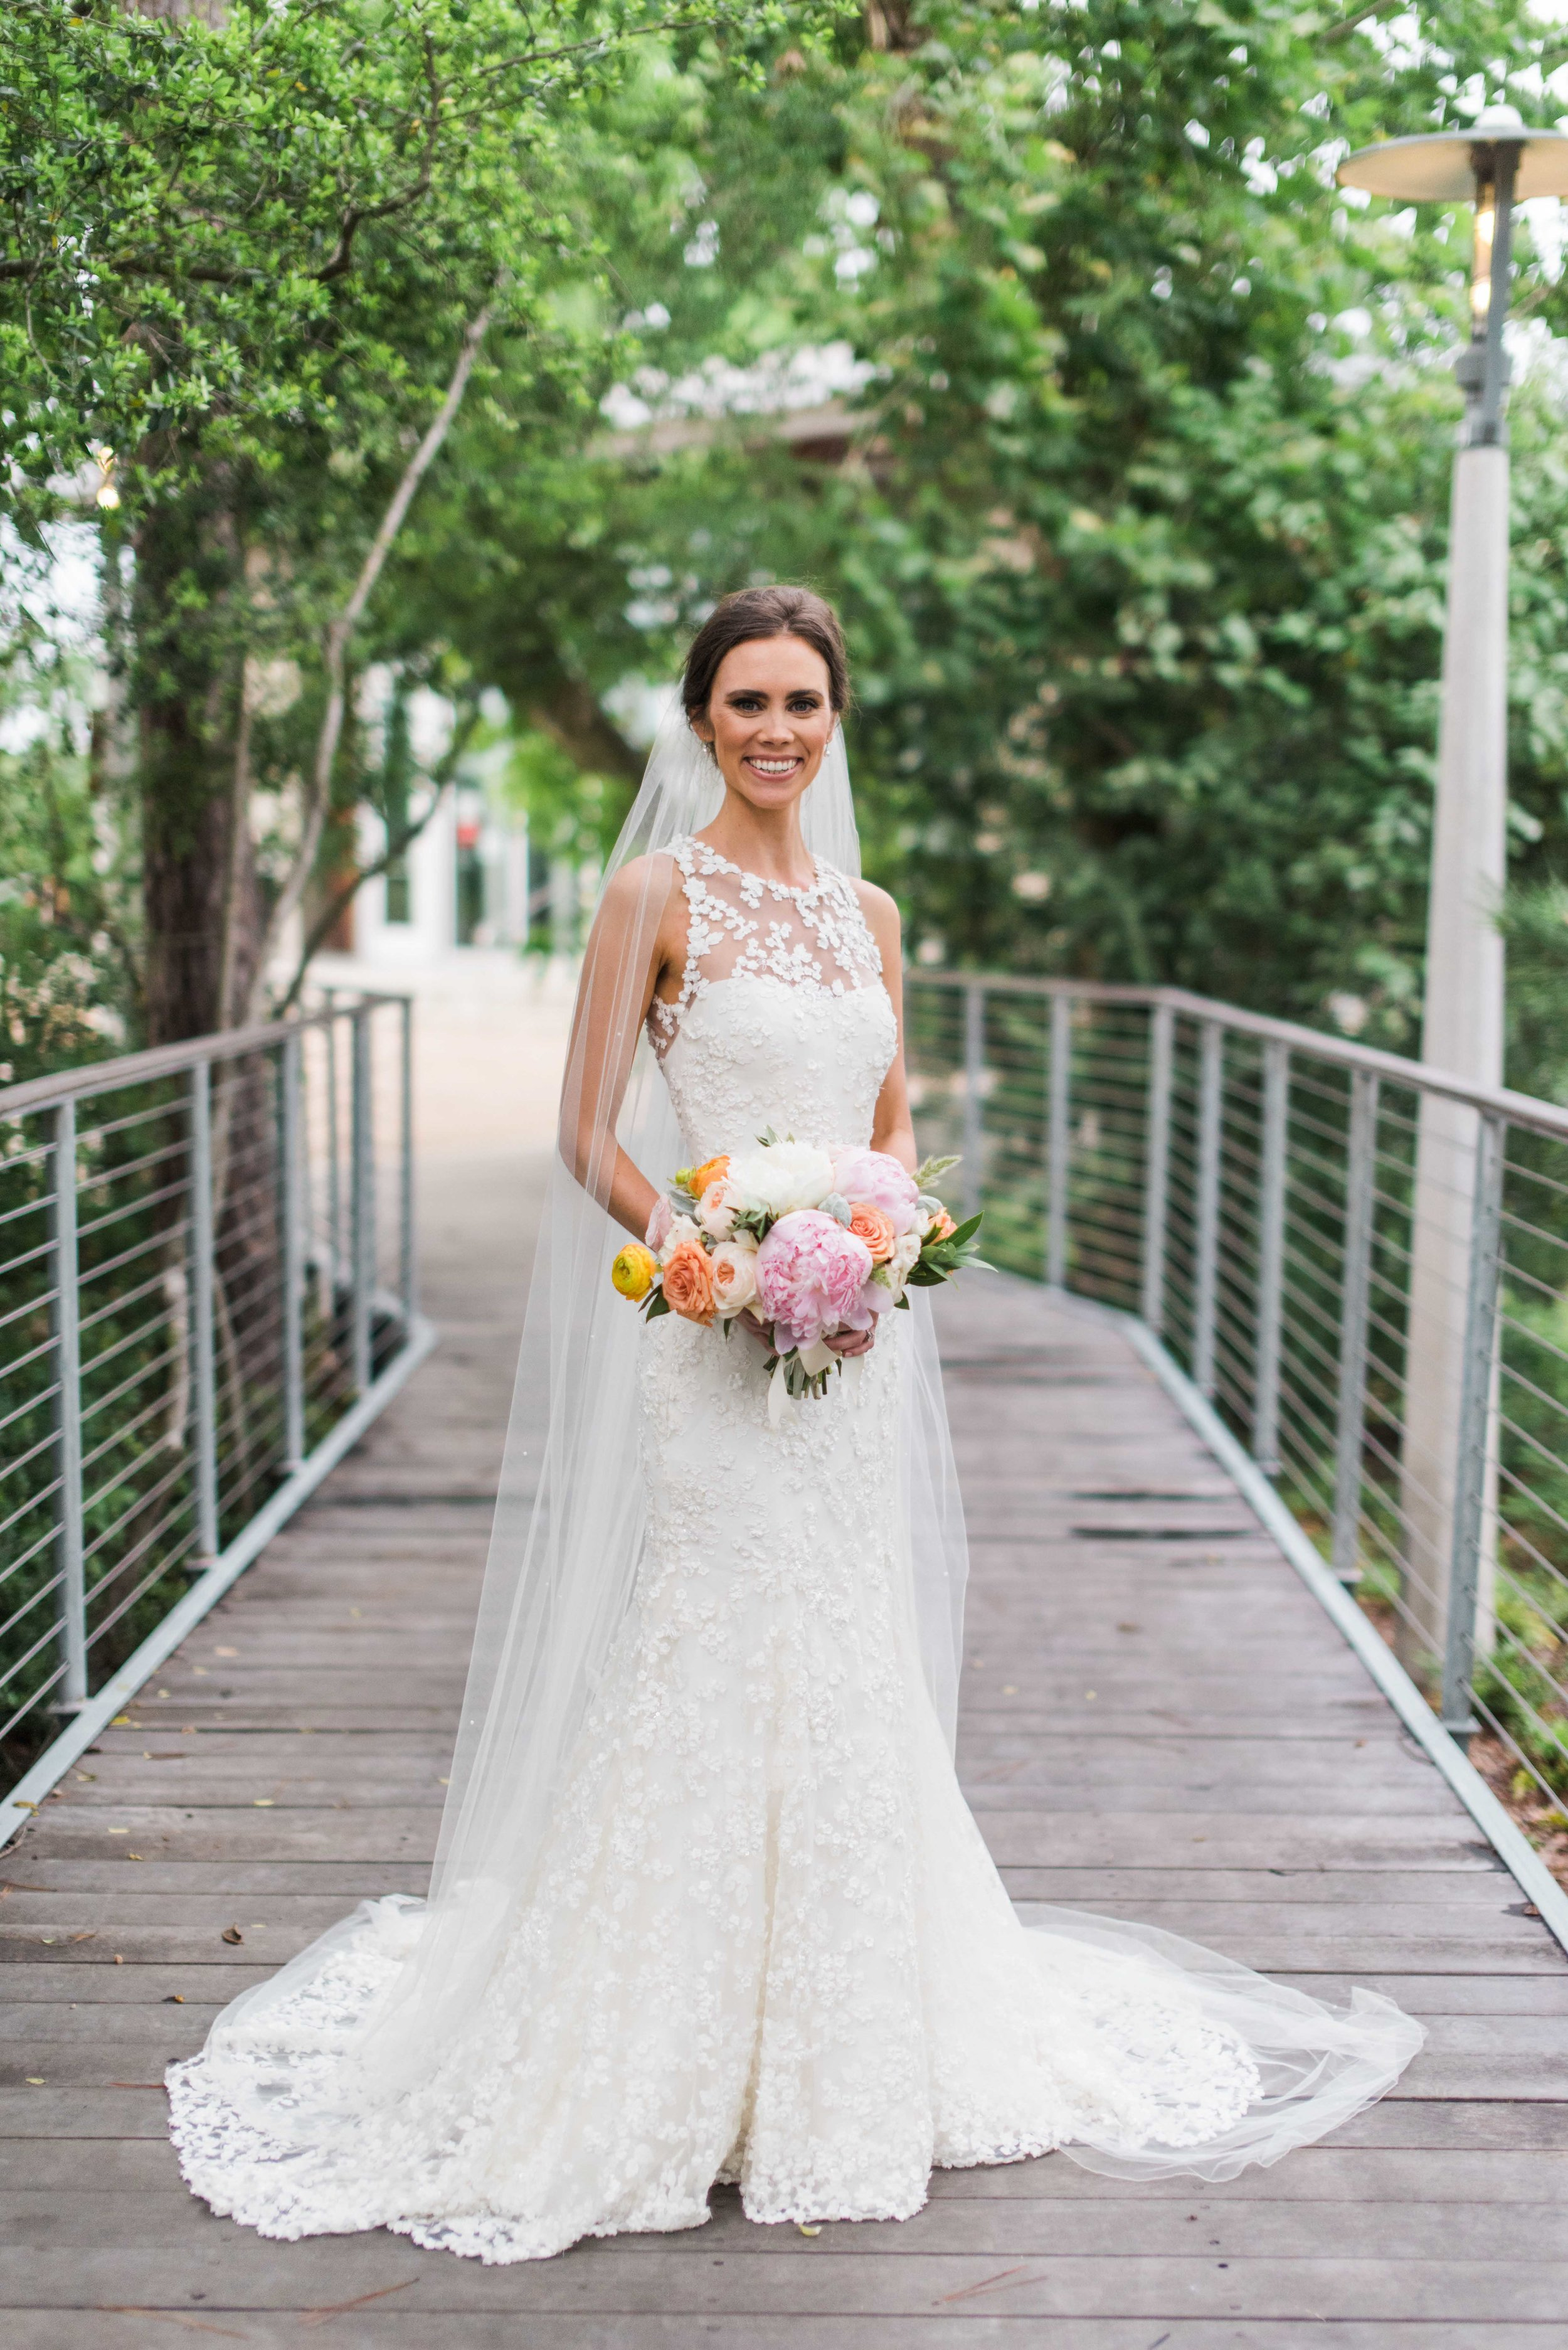 The-Dunlavy-Wedding-Photography-Bridals-Houston-Film-Dana-Fernandez-Photography-Potraits-10.jpg